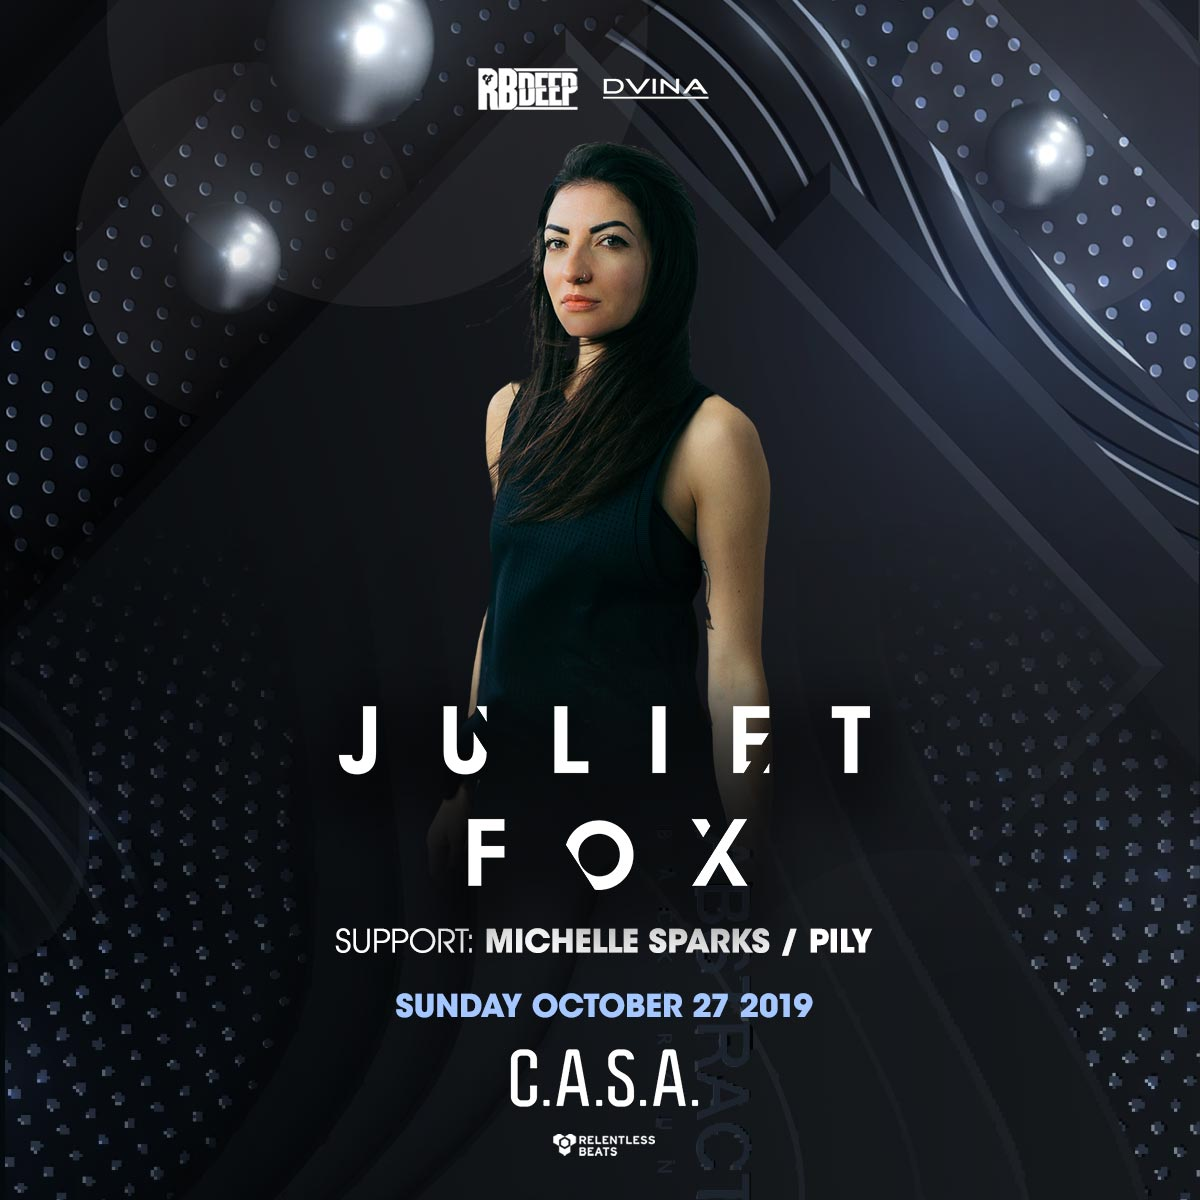 Flyer for Juliet Fox